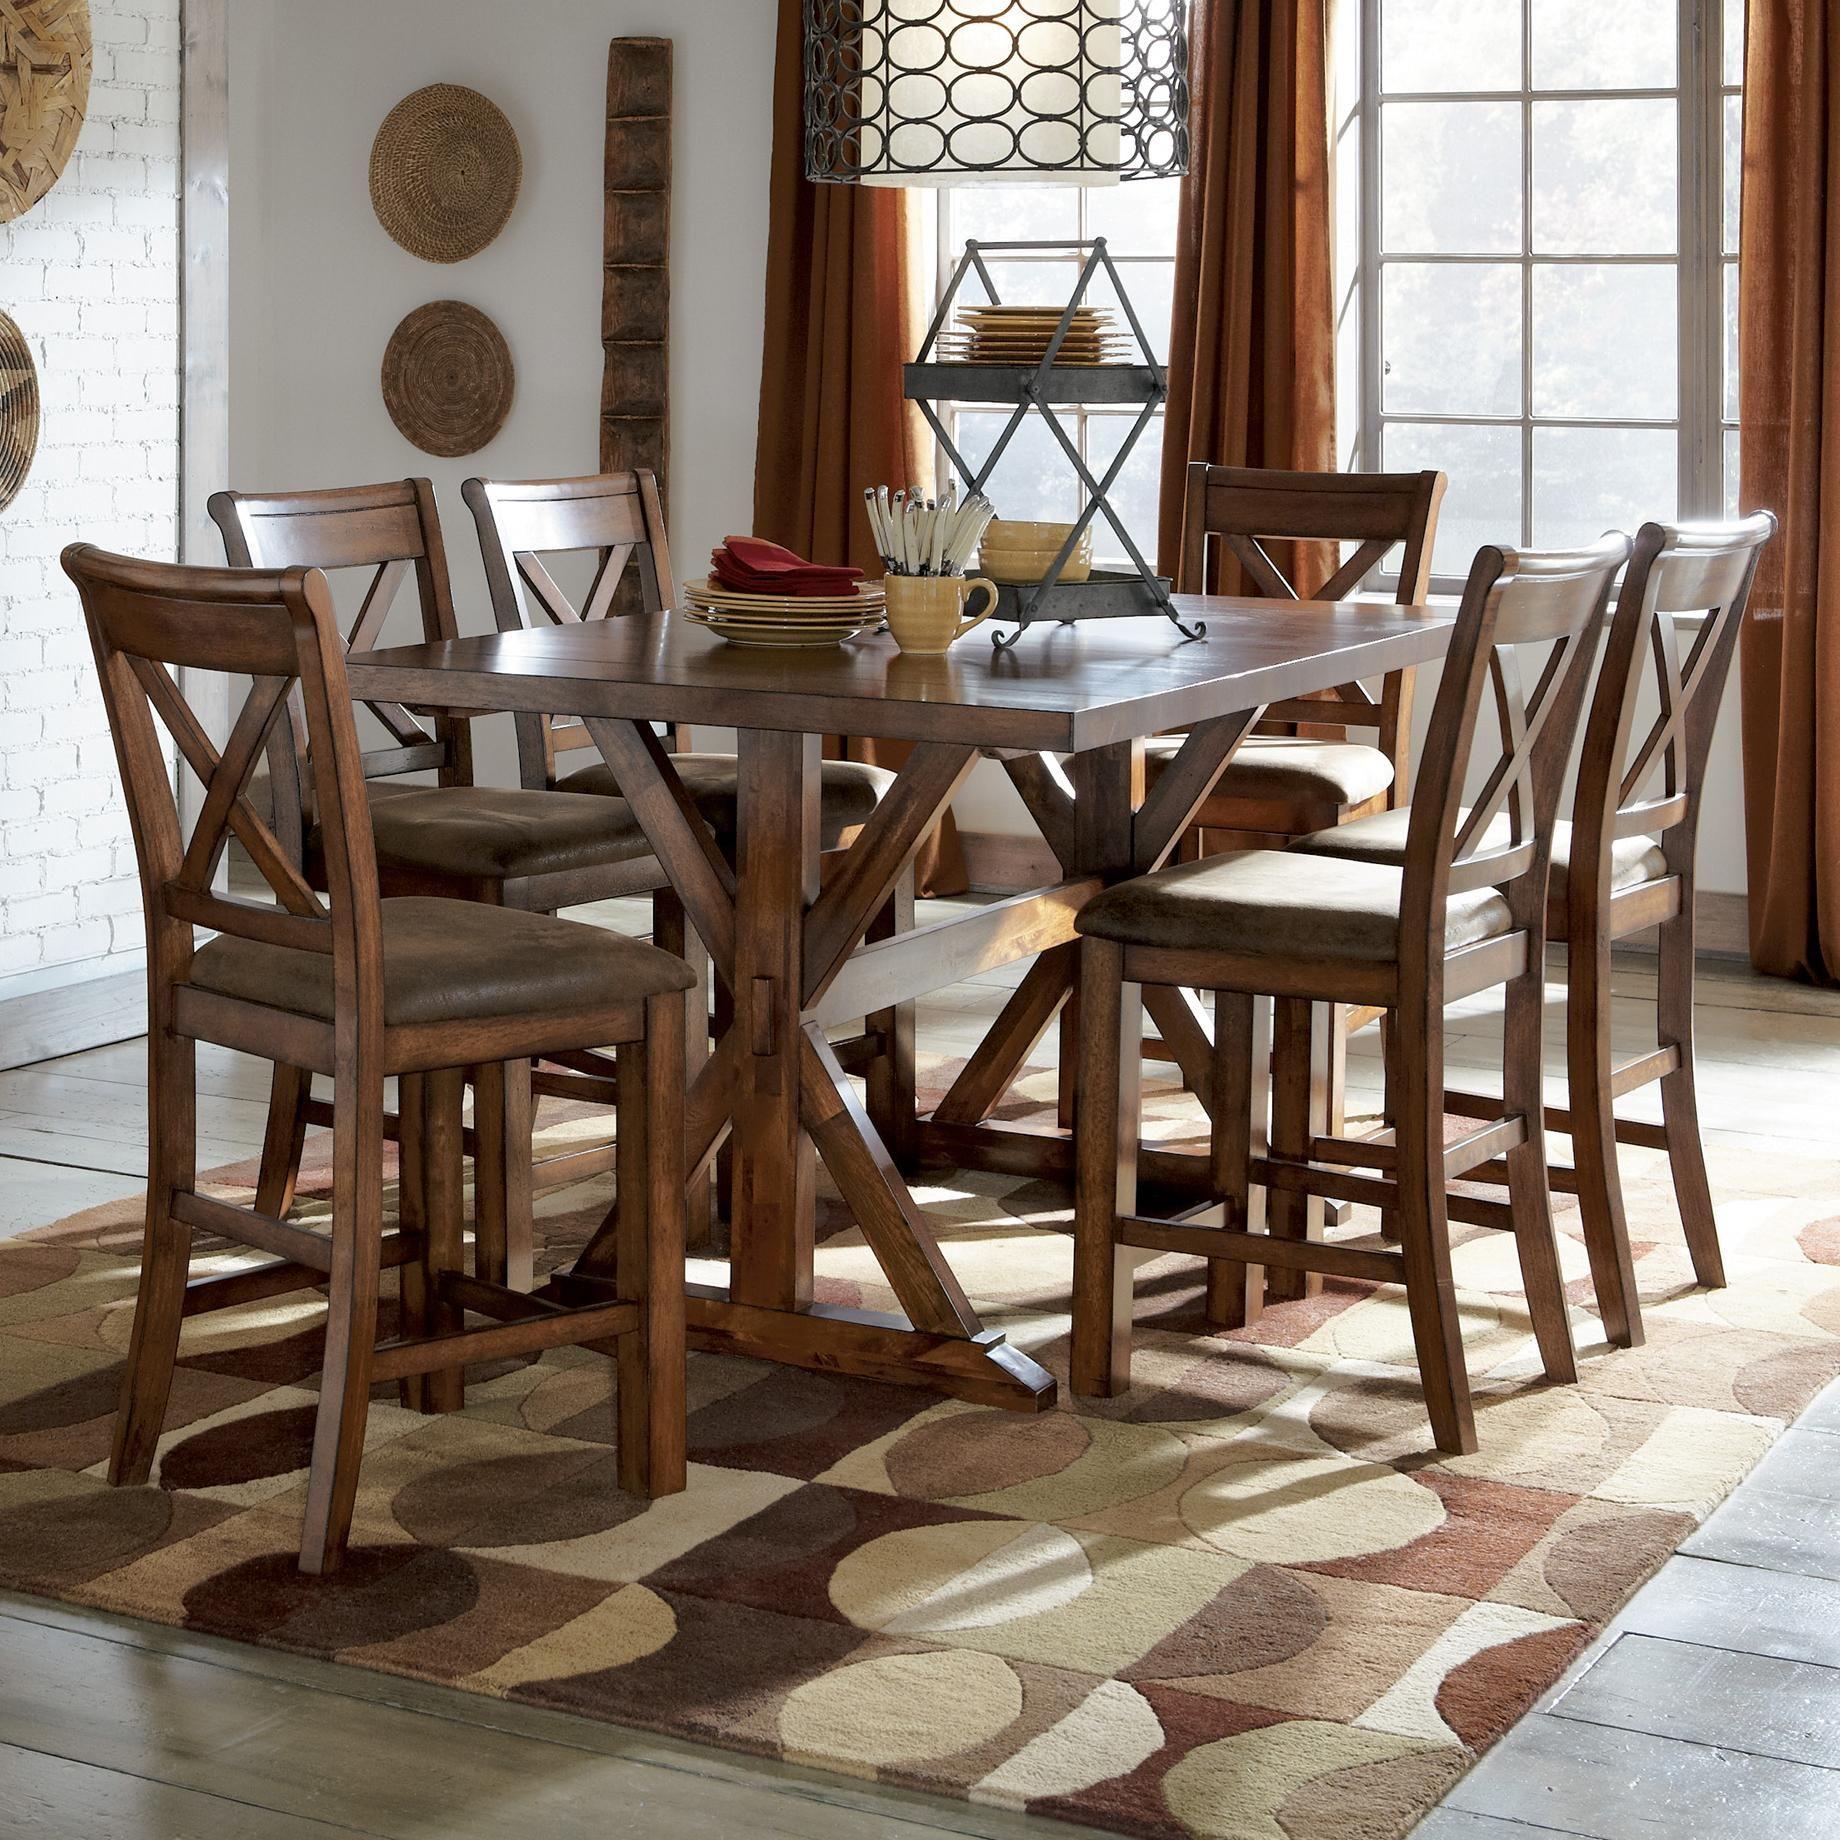 Moderno Ashley Mesa De La Cocina Muebles Modelo - Ideas de ...